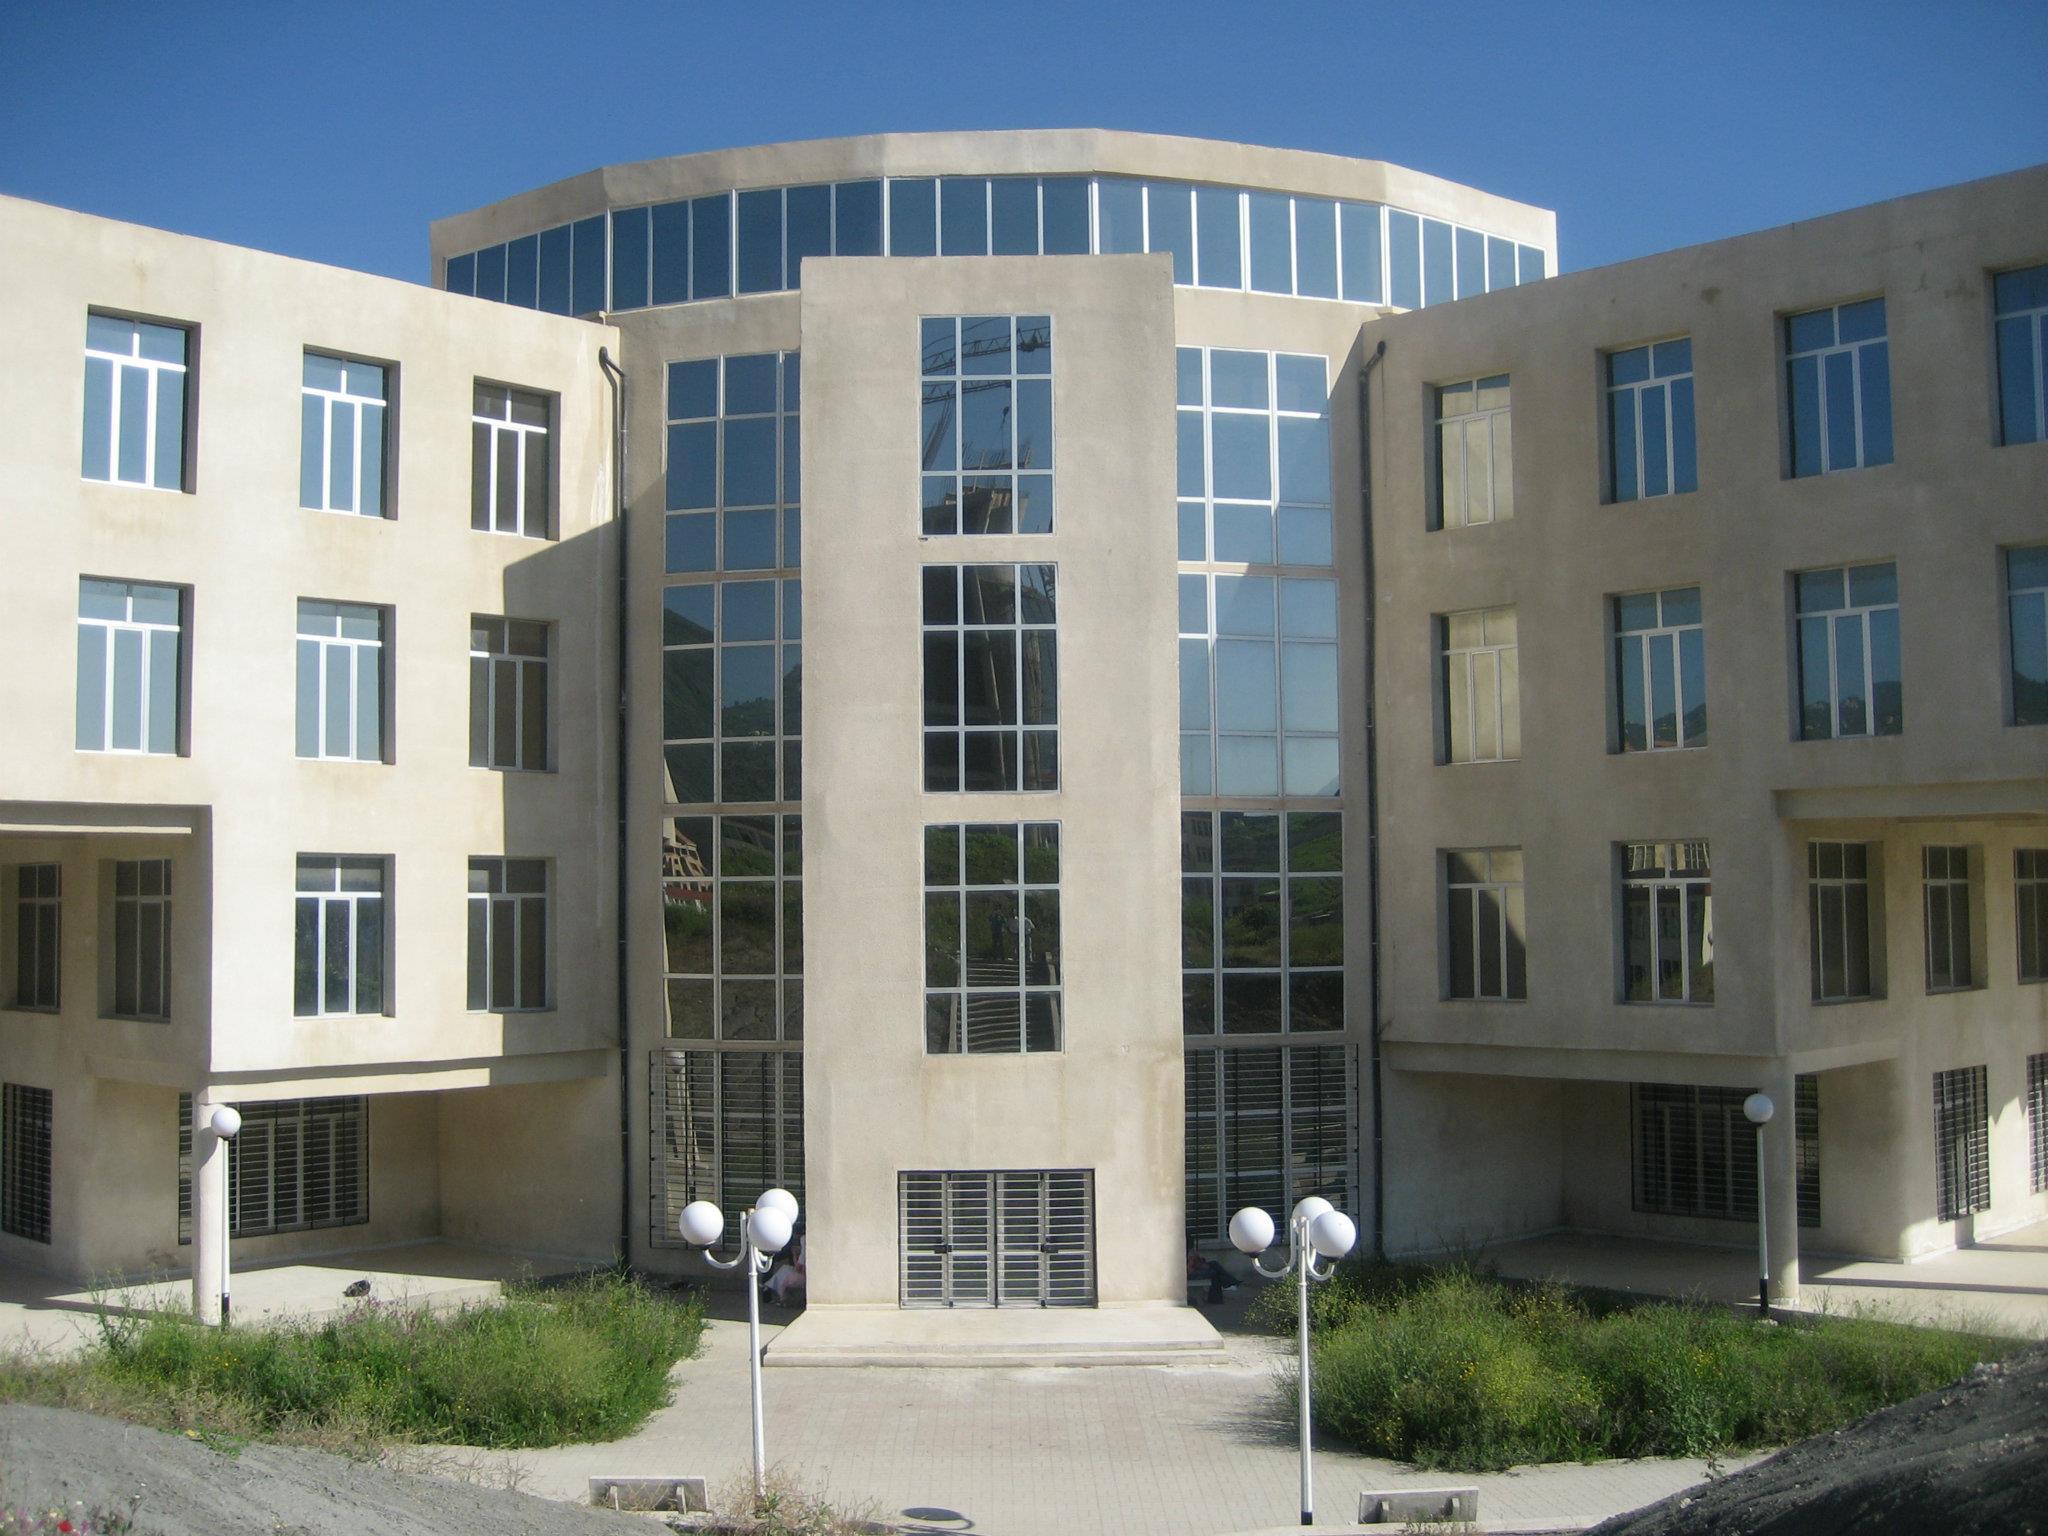 Mouloud Mammeri de Tizi Ouzou University - UMMTO Campus